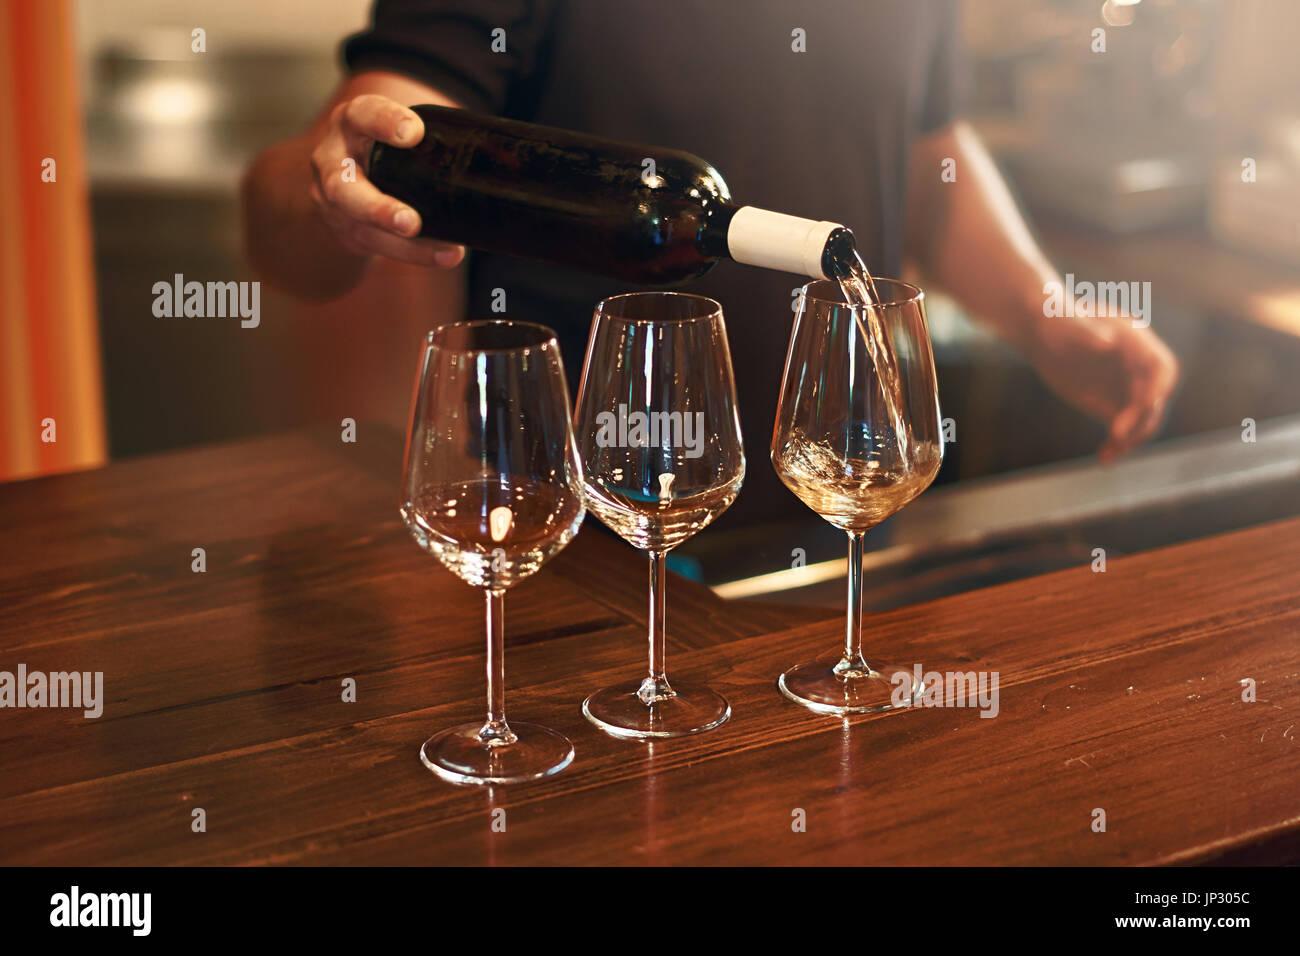 Sommelier pours pinot gris wine in glasses for degustation - Stock Image